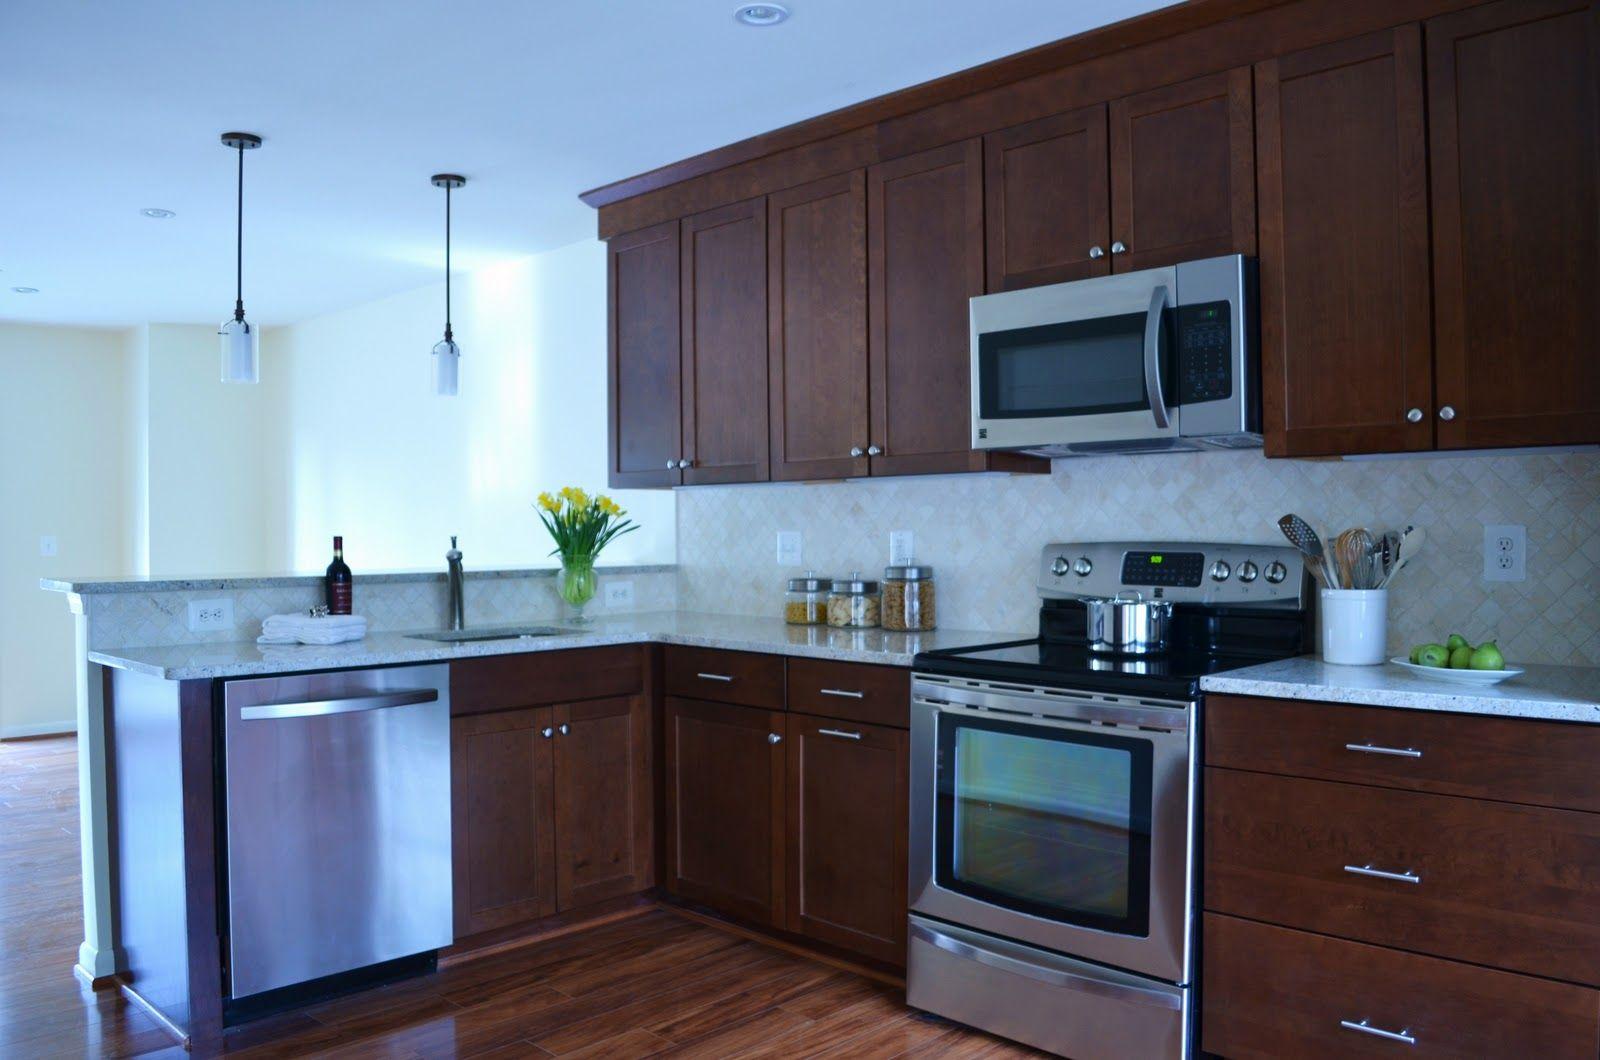 Image result for menards kitchen cabinets | Küchen ...